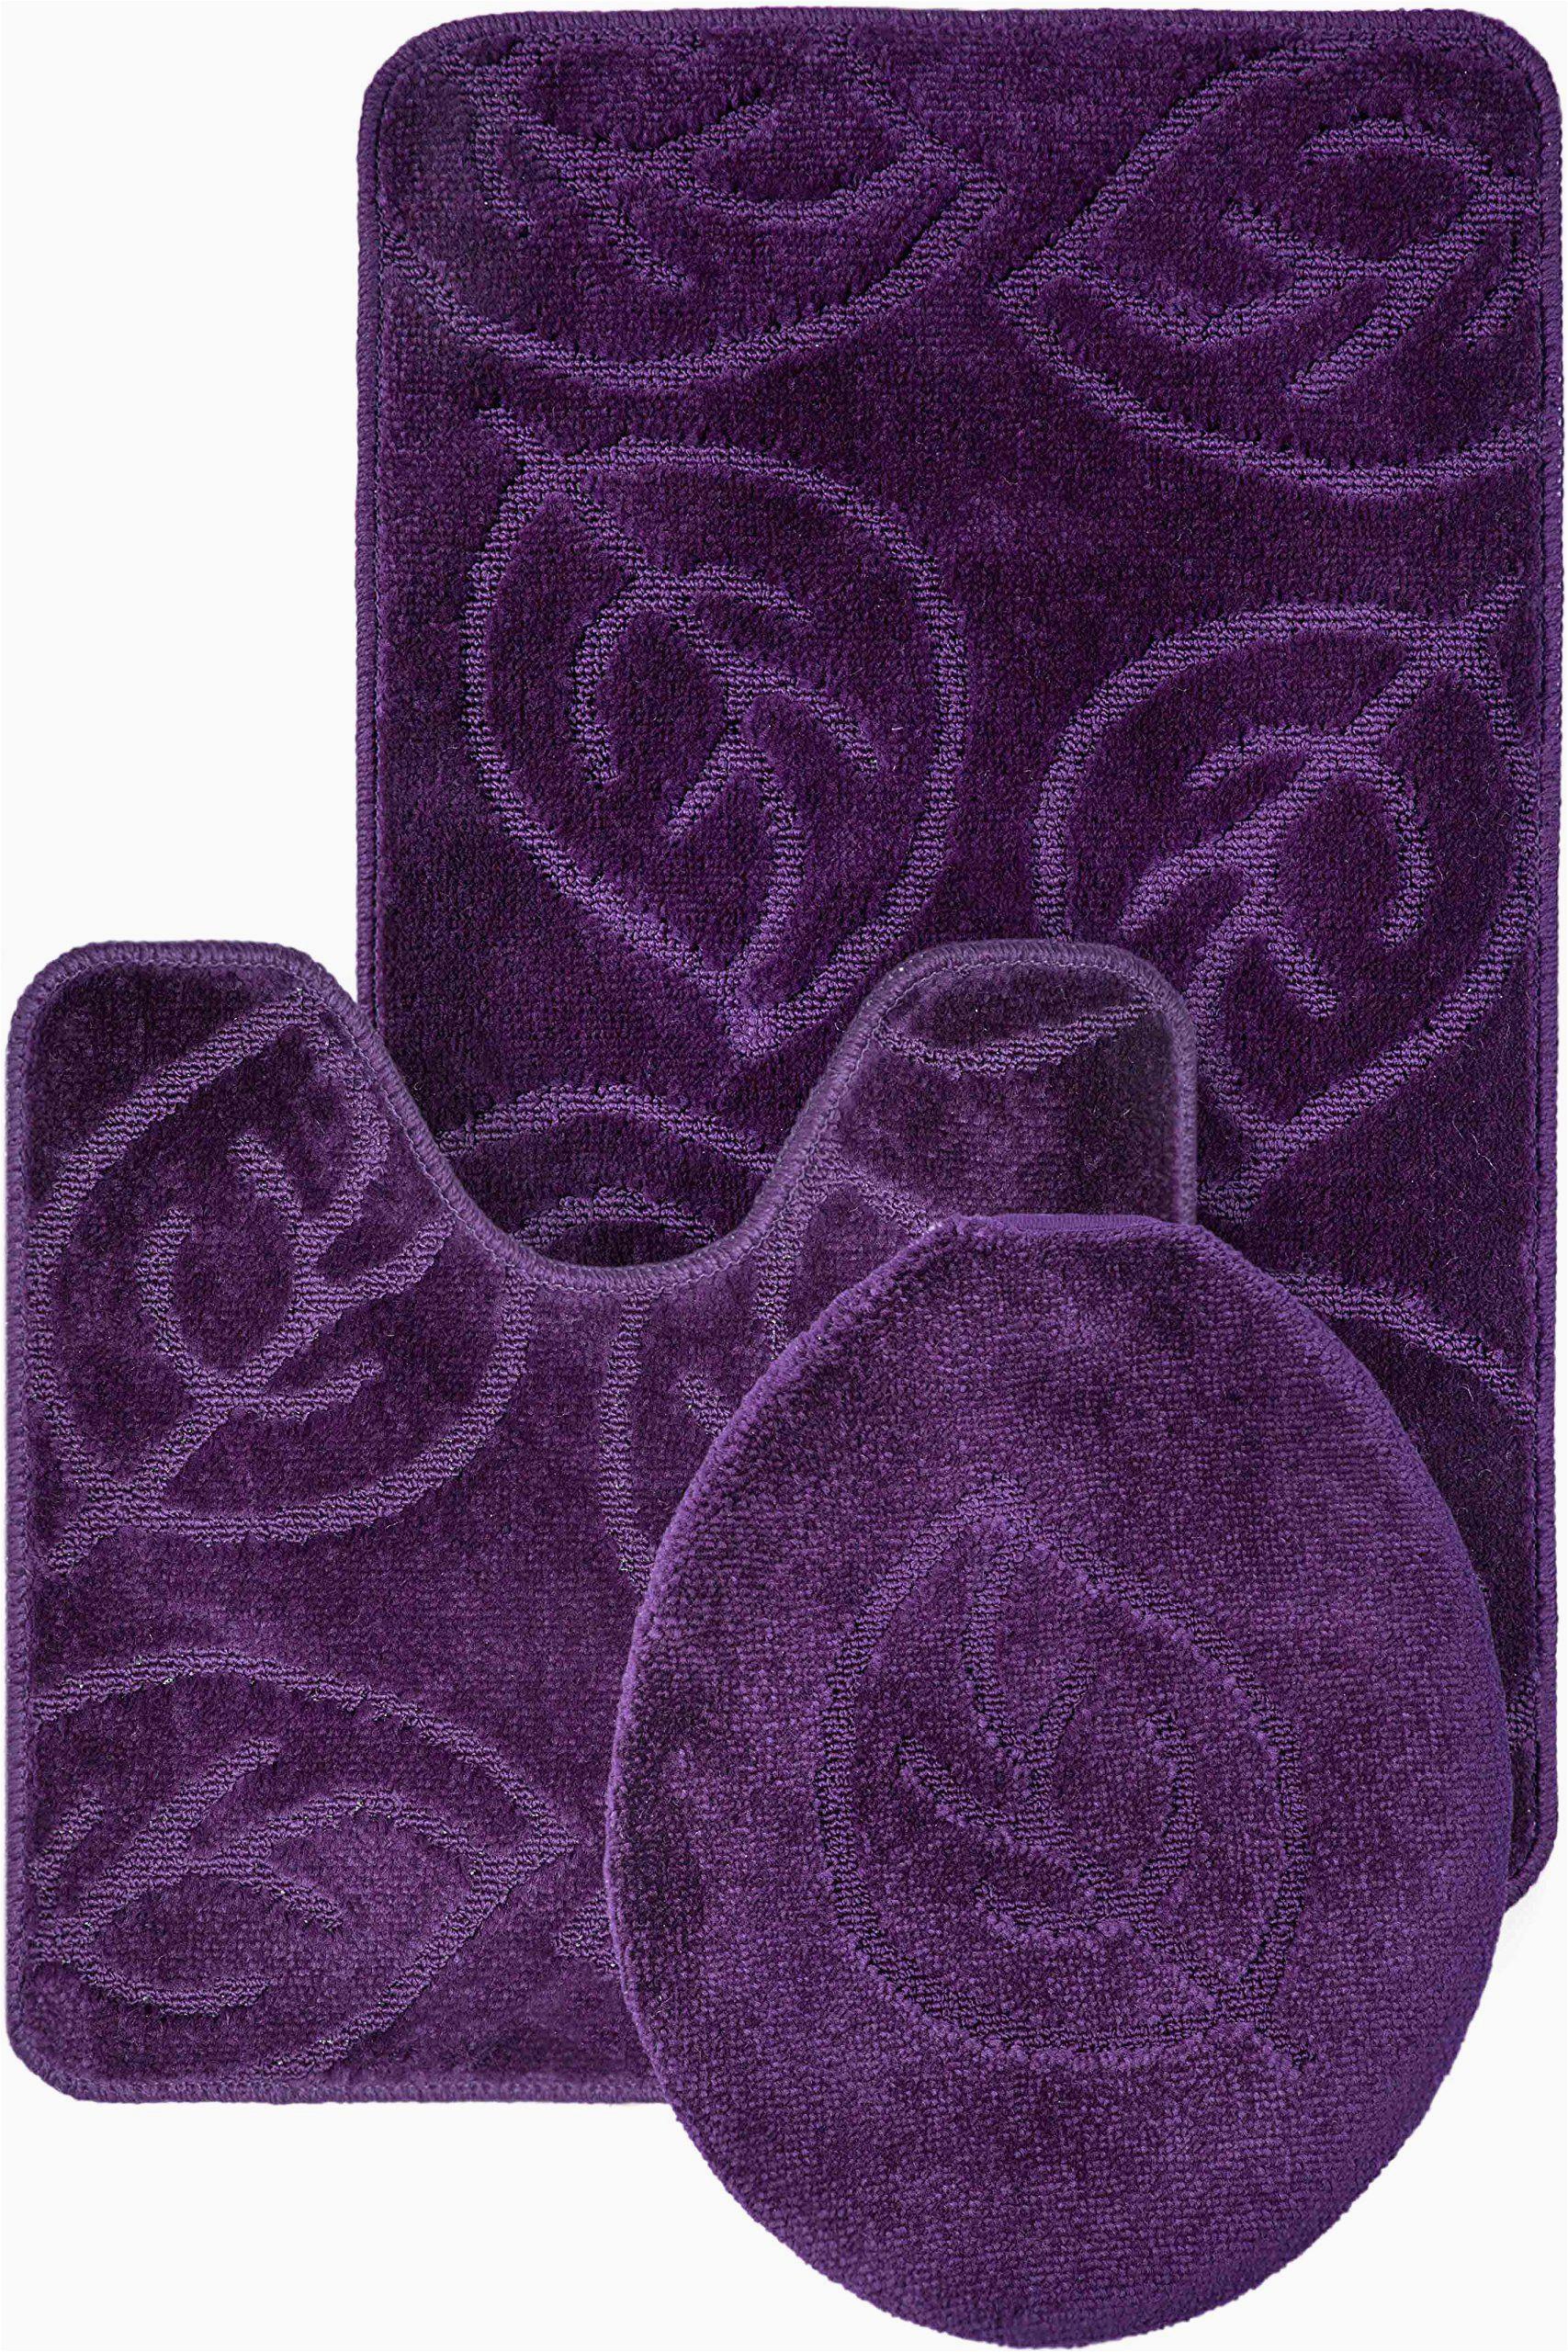 Dark Purple Bathroom Rug Set Everdayspecial Purple Bath Set Leaf Pattern Bathroom Rug